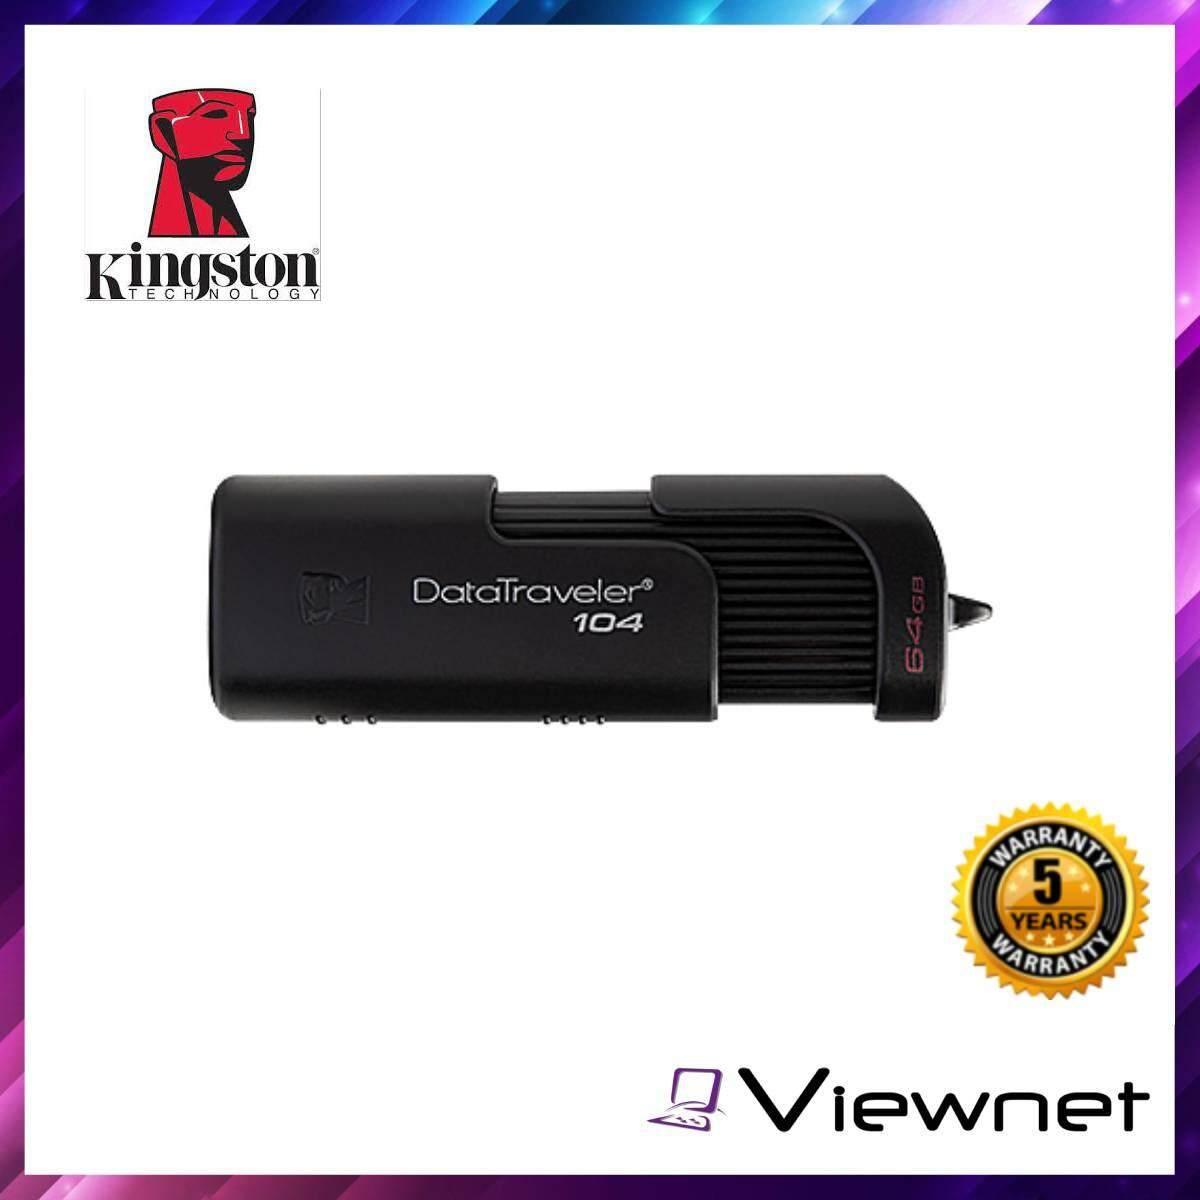 8.8 Kingston DataTraveler 104 (DT104) USB Flash Drive (16GB32GB64GB) Black portable for easy transportability stylish sliding cap design